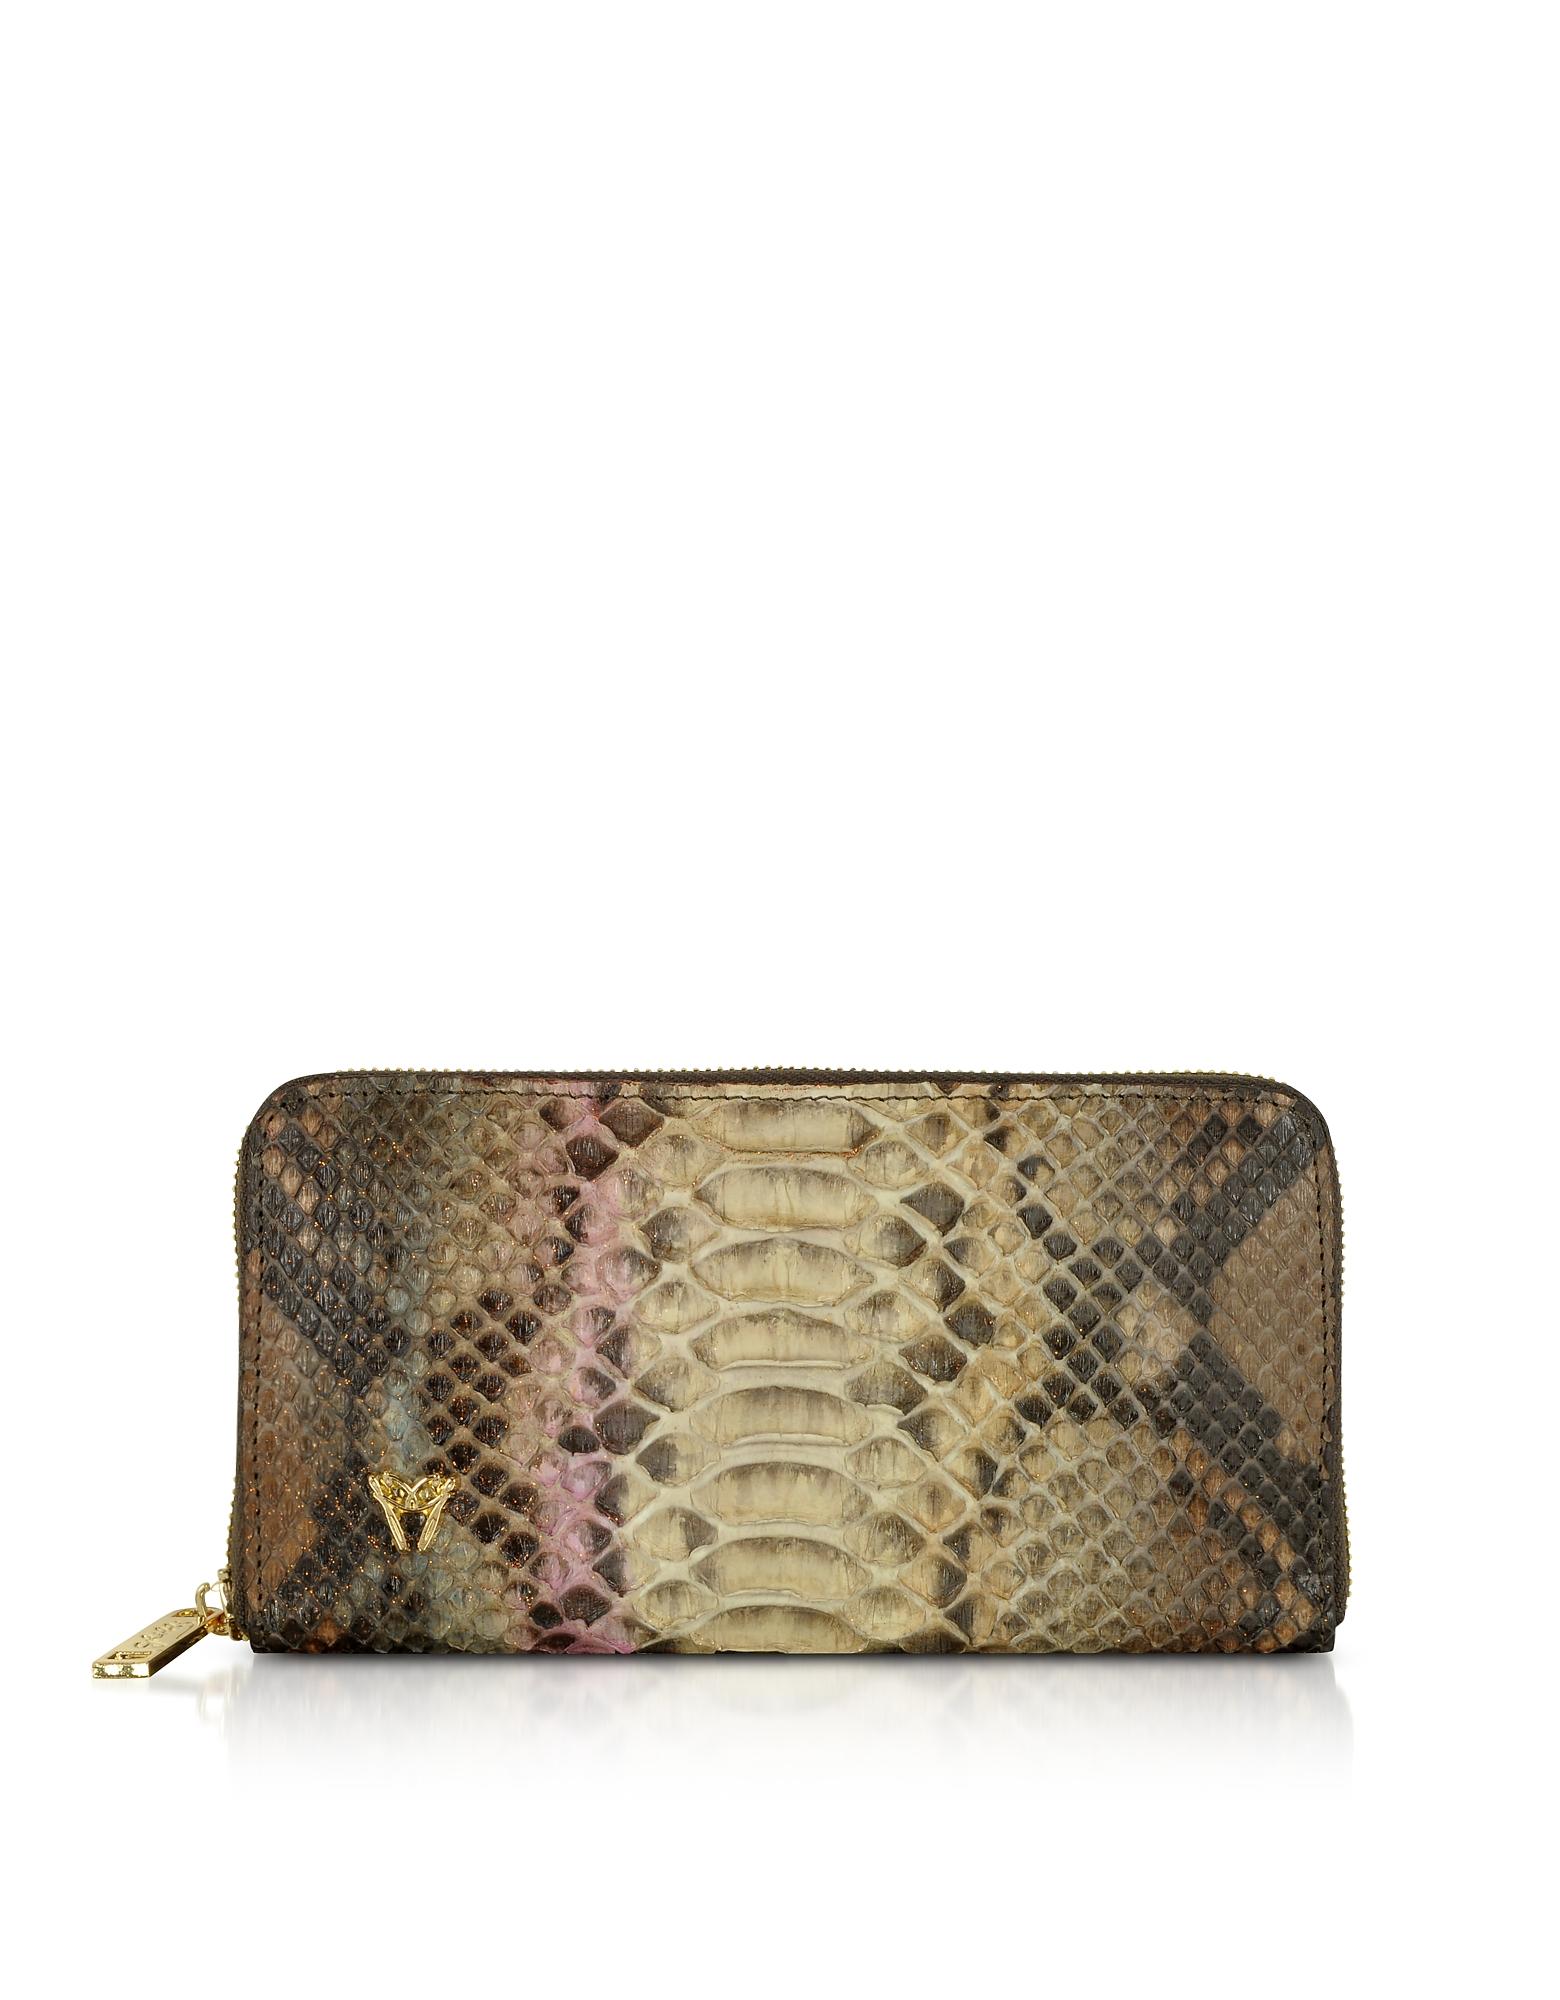 Ghibli Handbags, Glitter Python Leather Continental Wallet